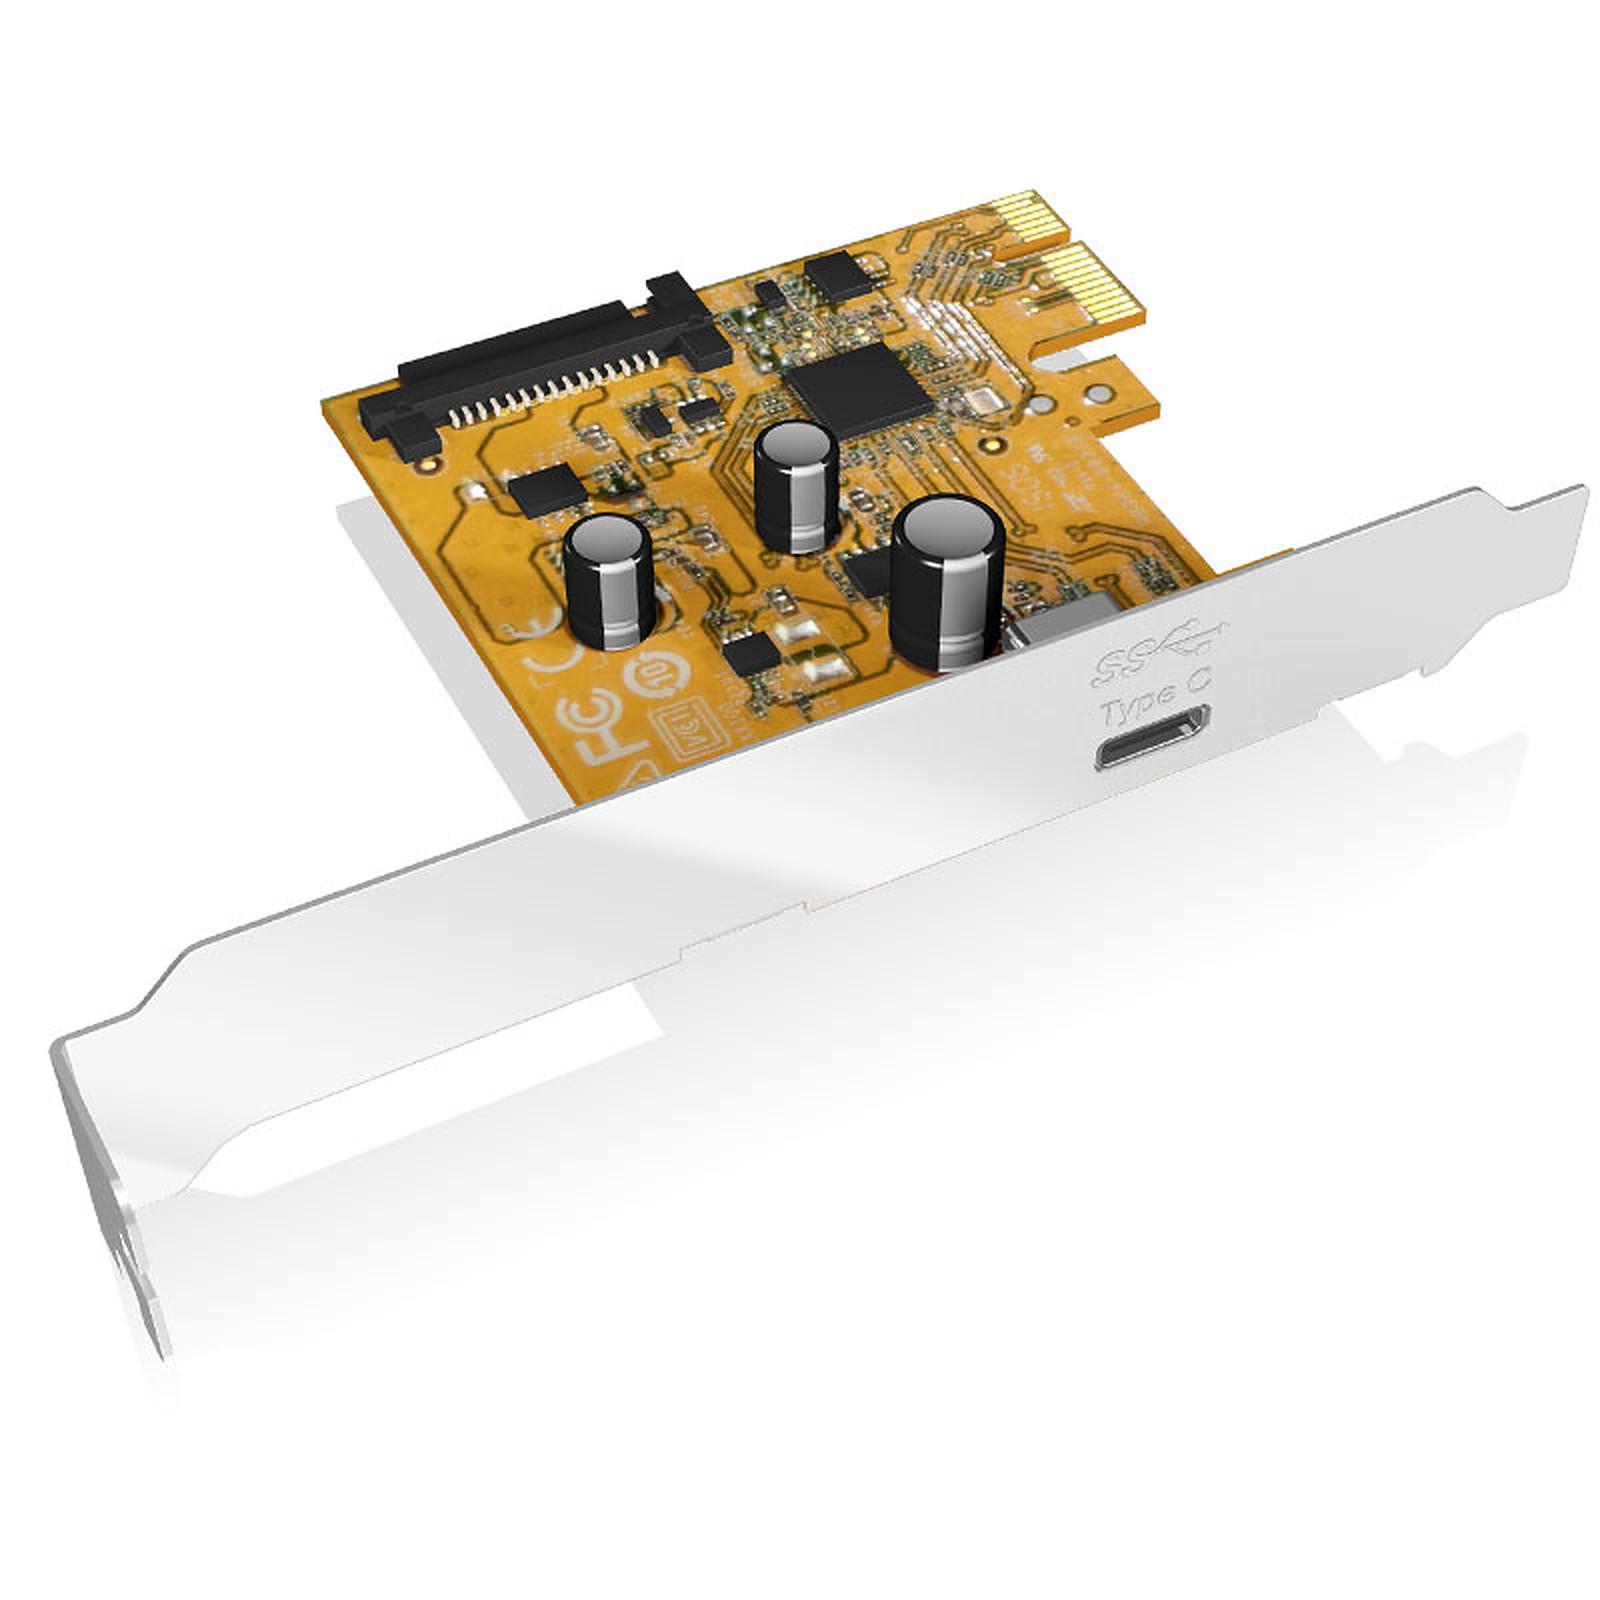 ICY BOX Carte USB 3.1